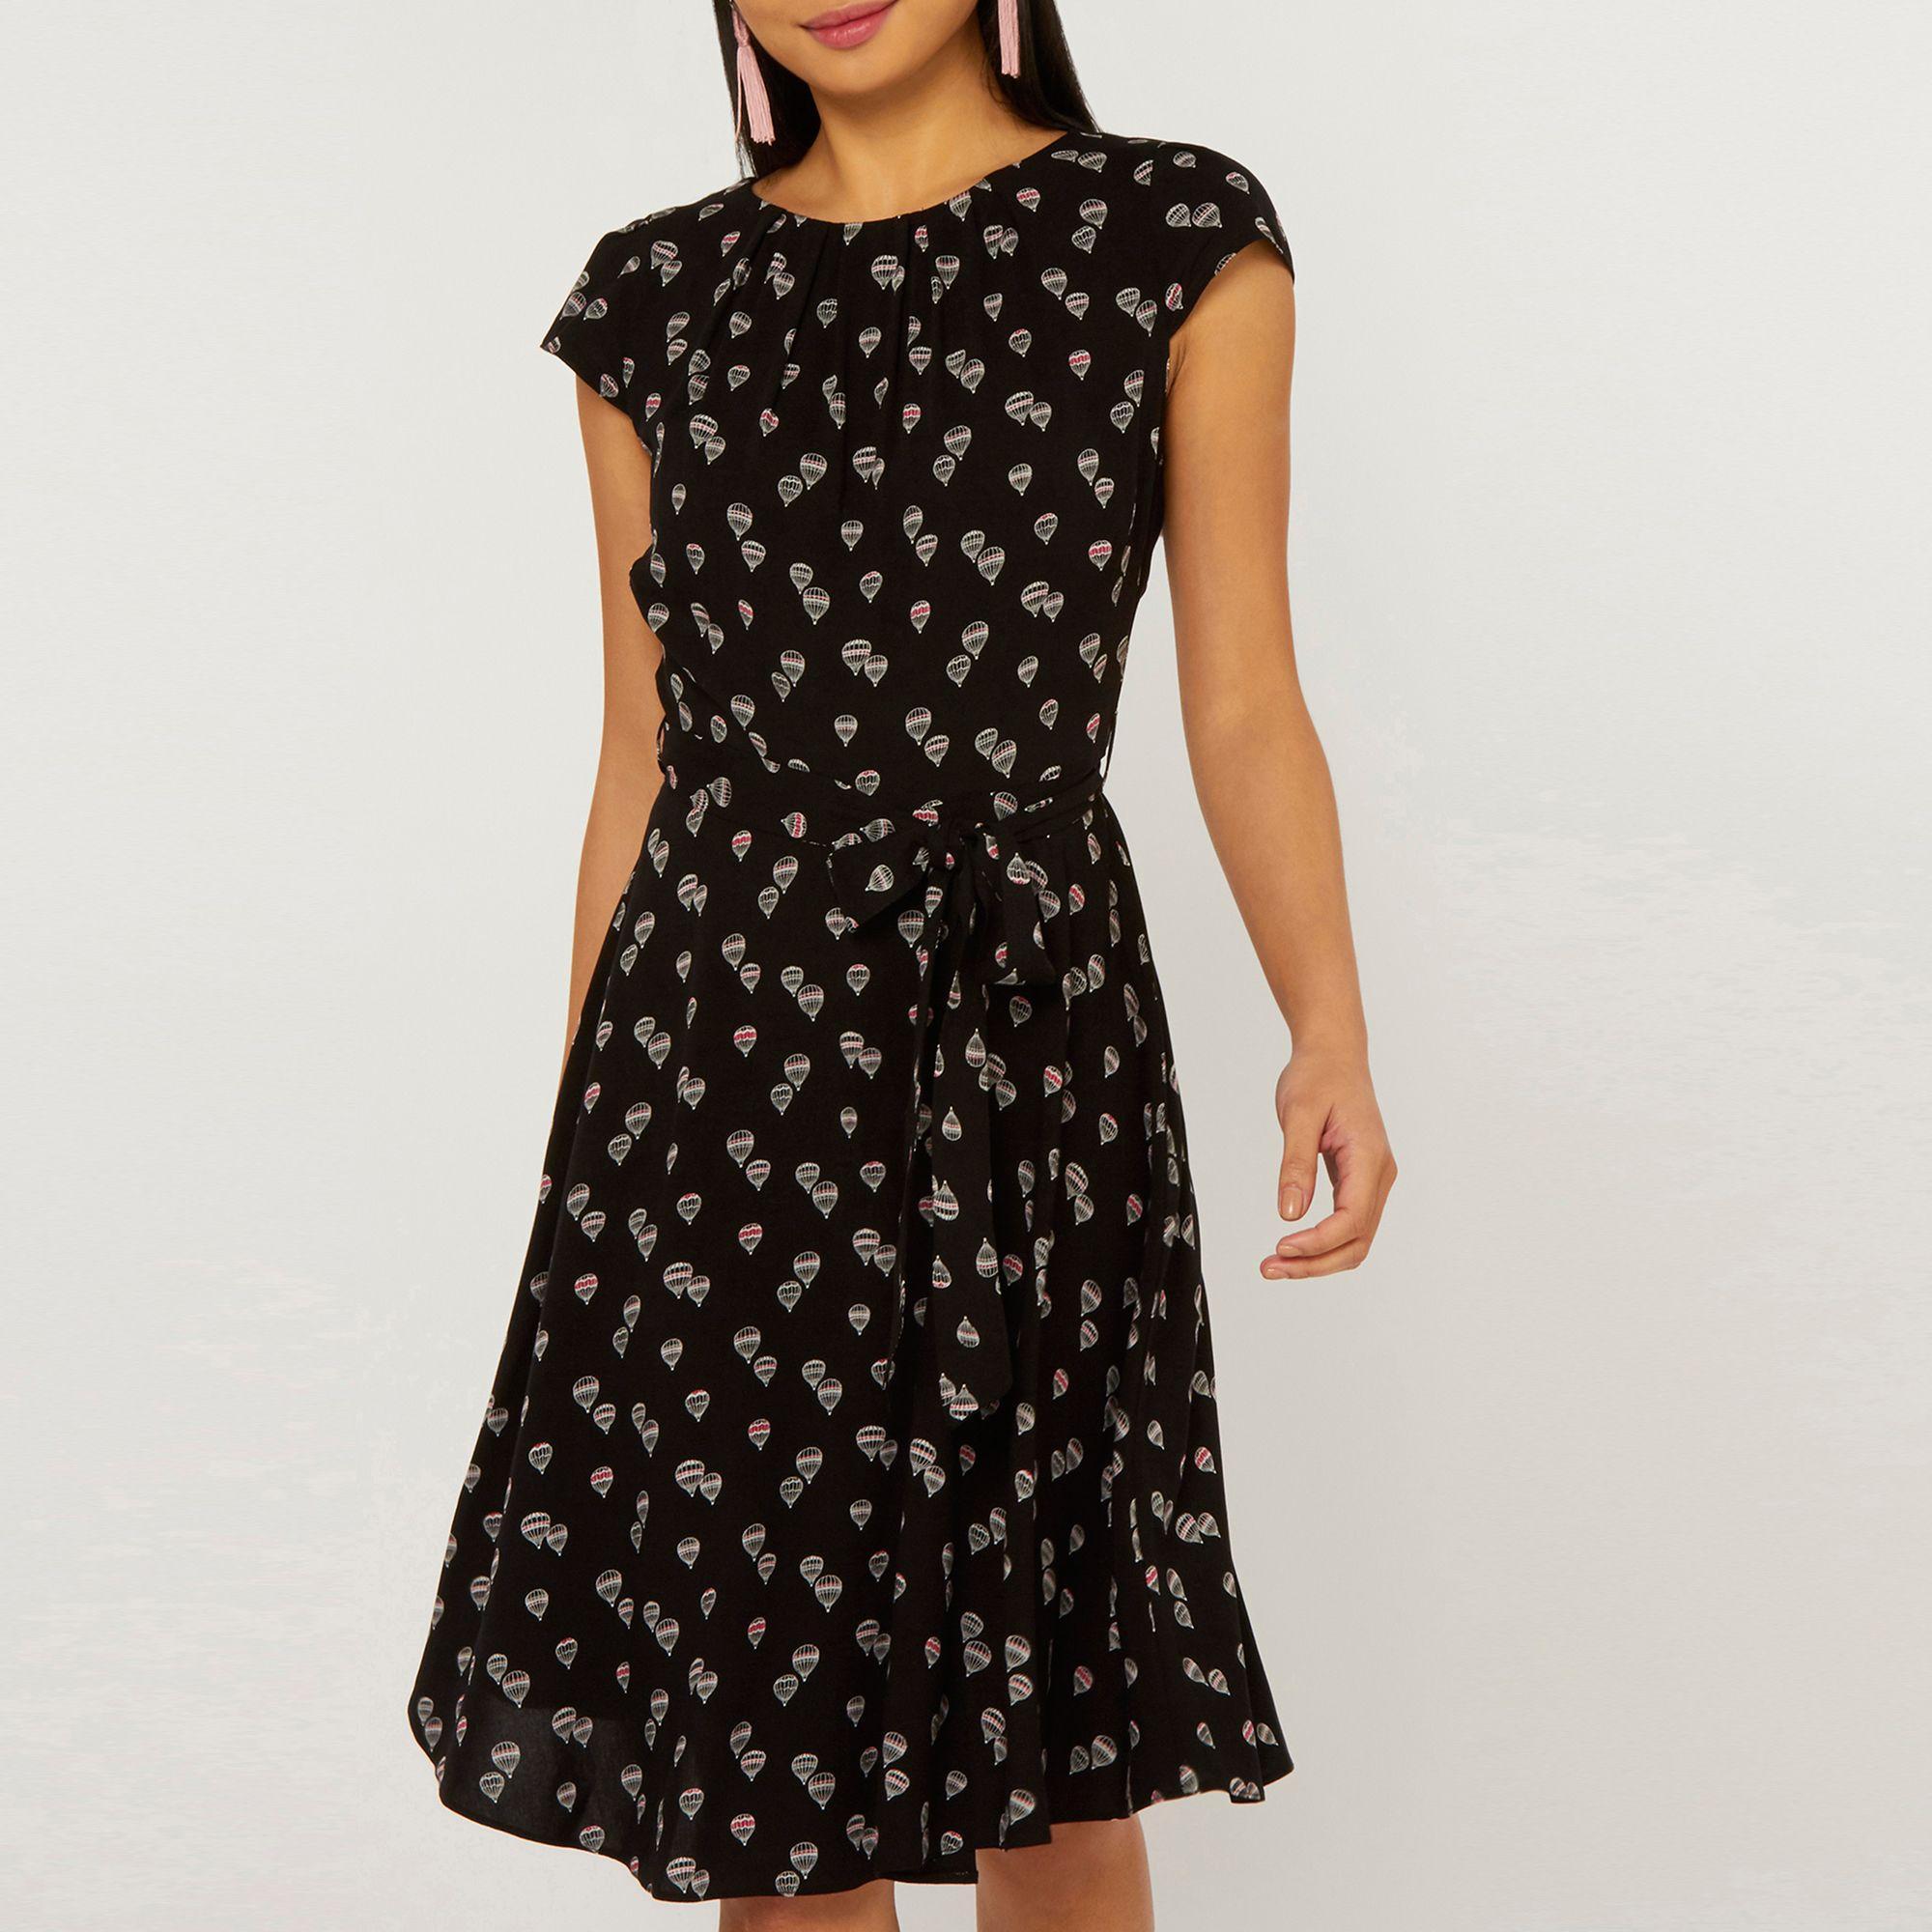 90e50da5469c Dorothy Perkins - Billie & Blossom Petite Black Balloon Print Skater Dress  - Lyst. View fullscreen